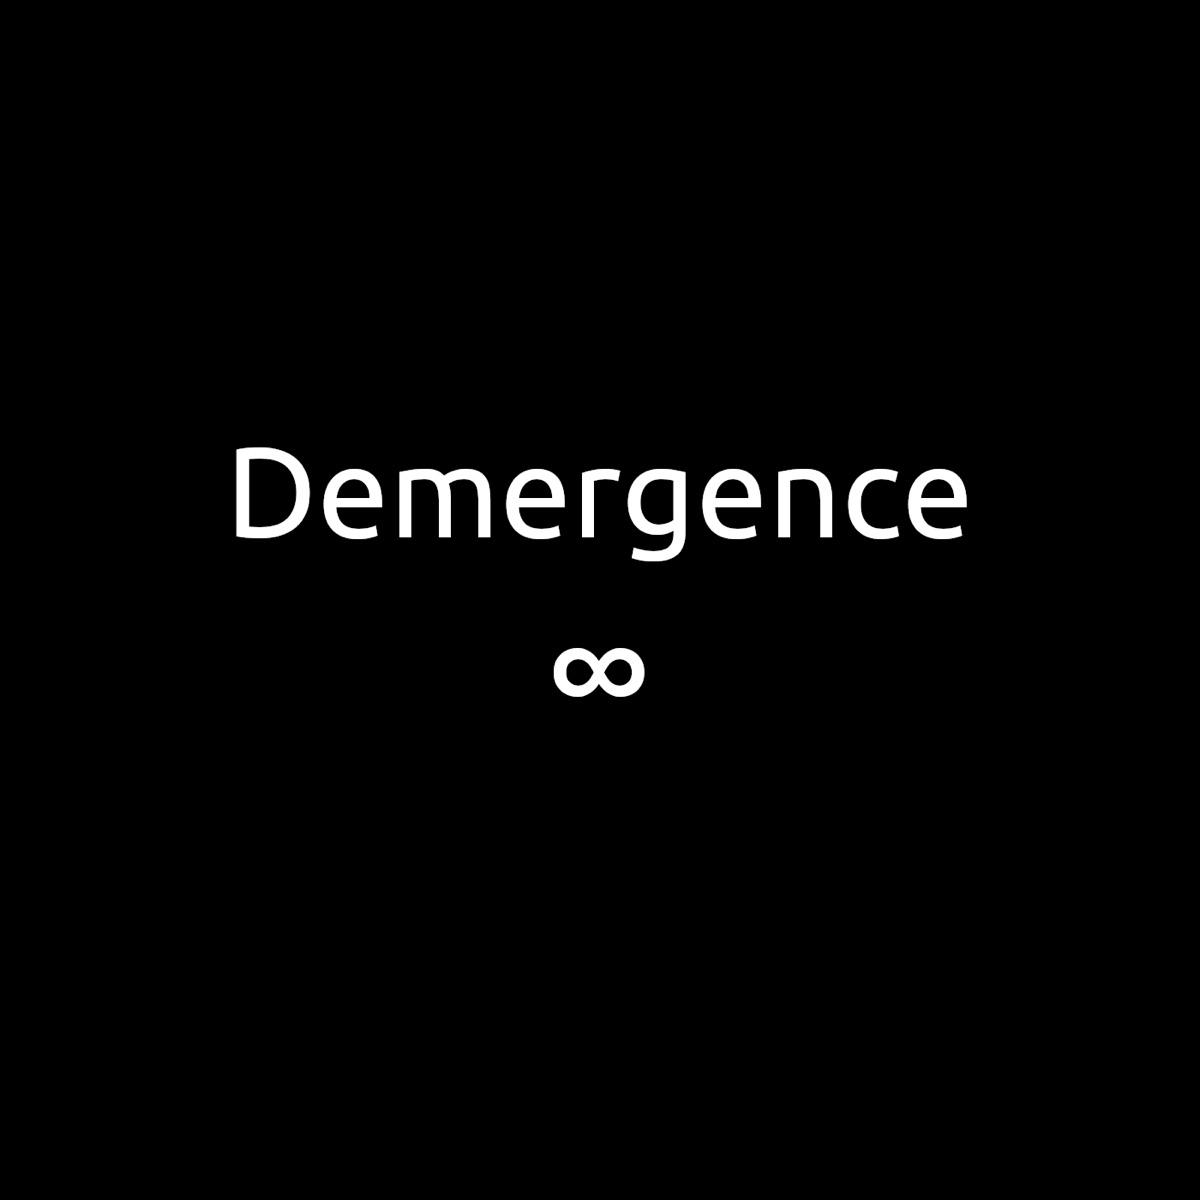 Demergence